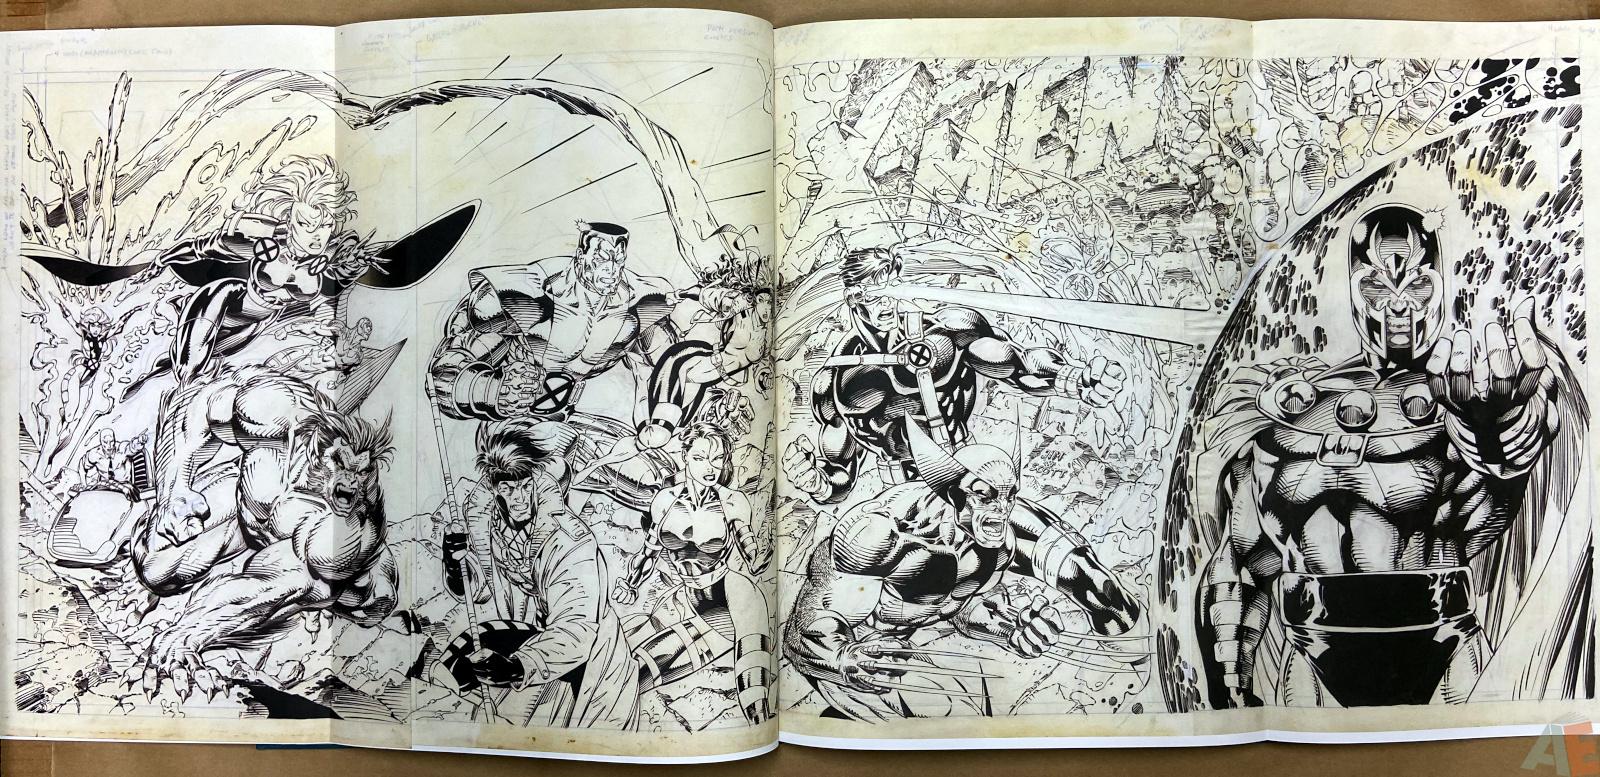 Jim Lees X Men Artists Edition interior 11